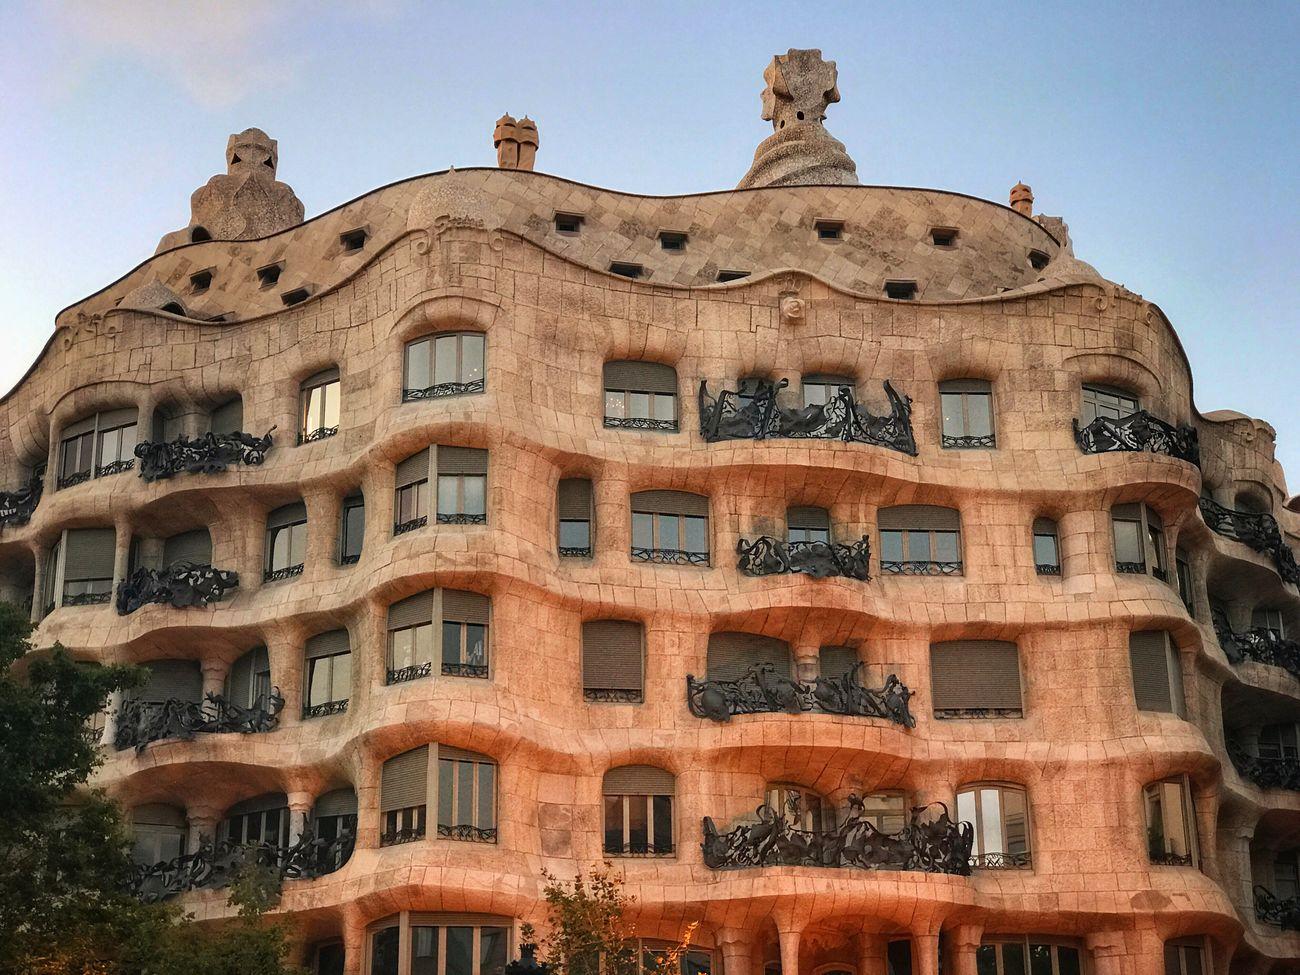 La Pedrera or Casa Mila designed by Antoni Gaudi, Barcelona Architecture Low Angle View Building Exterior Window Built Structure No People Day Sky Outdoors Clear Sky Casa Mila ( La Pedrera ) Casa Mila La Pedrera EyeEm Selects Barcelona Catalonia Catalunya SPAIN